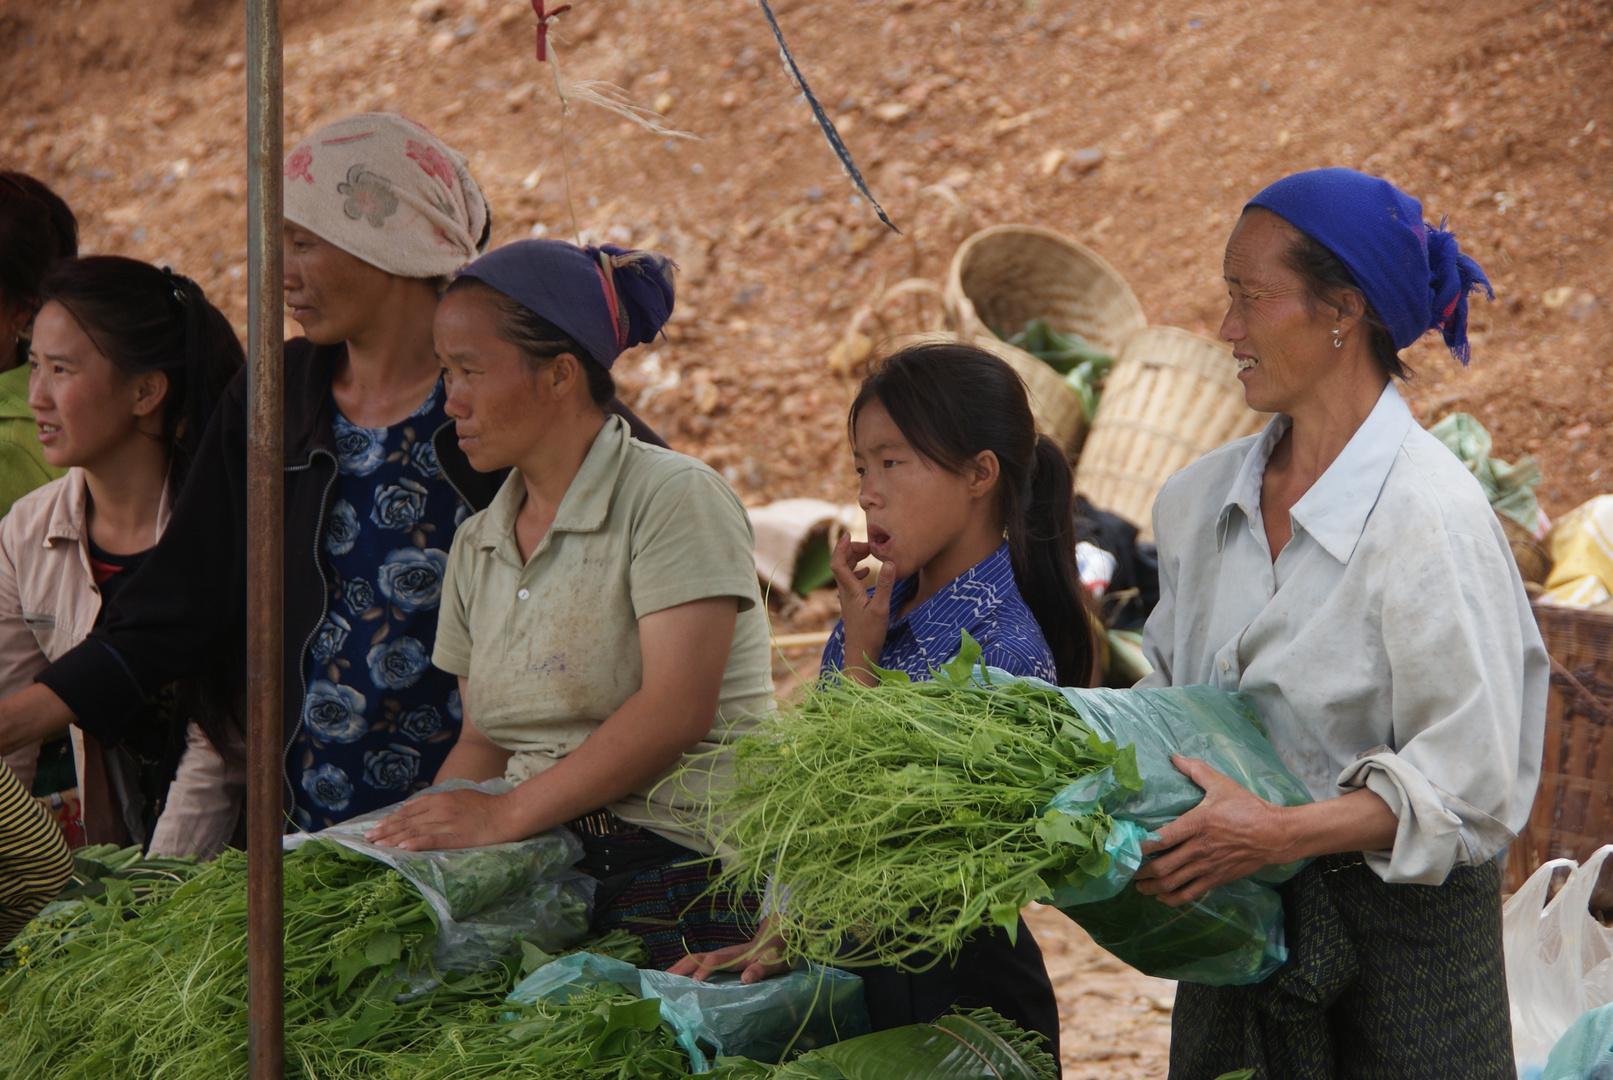 markt an der strassengabelung, laos 2010